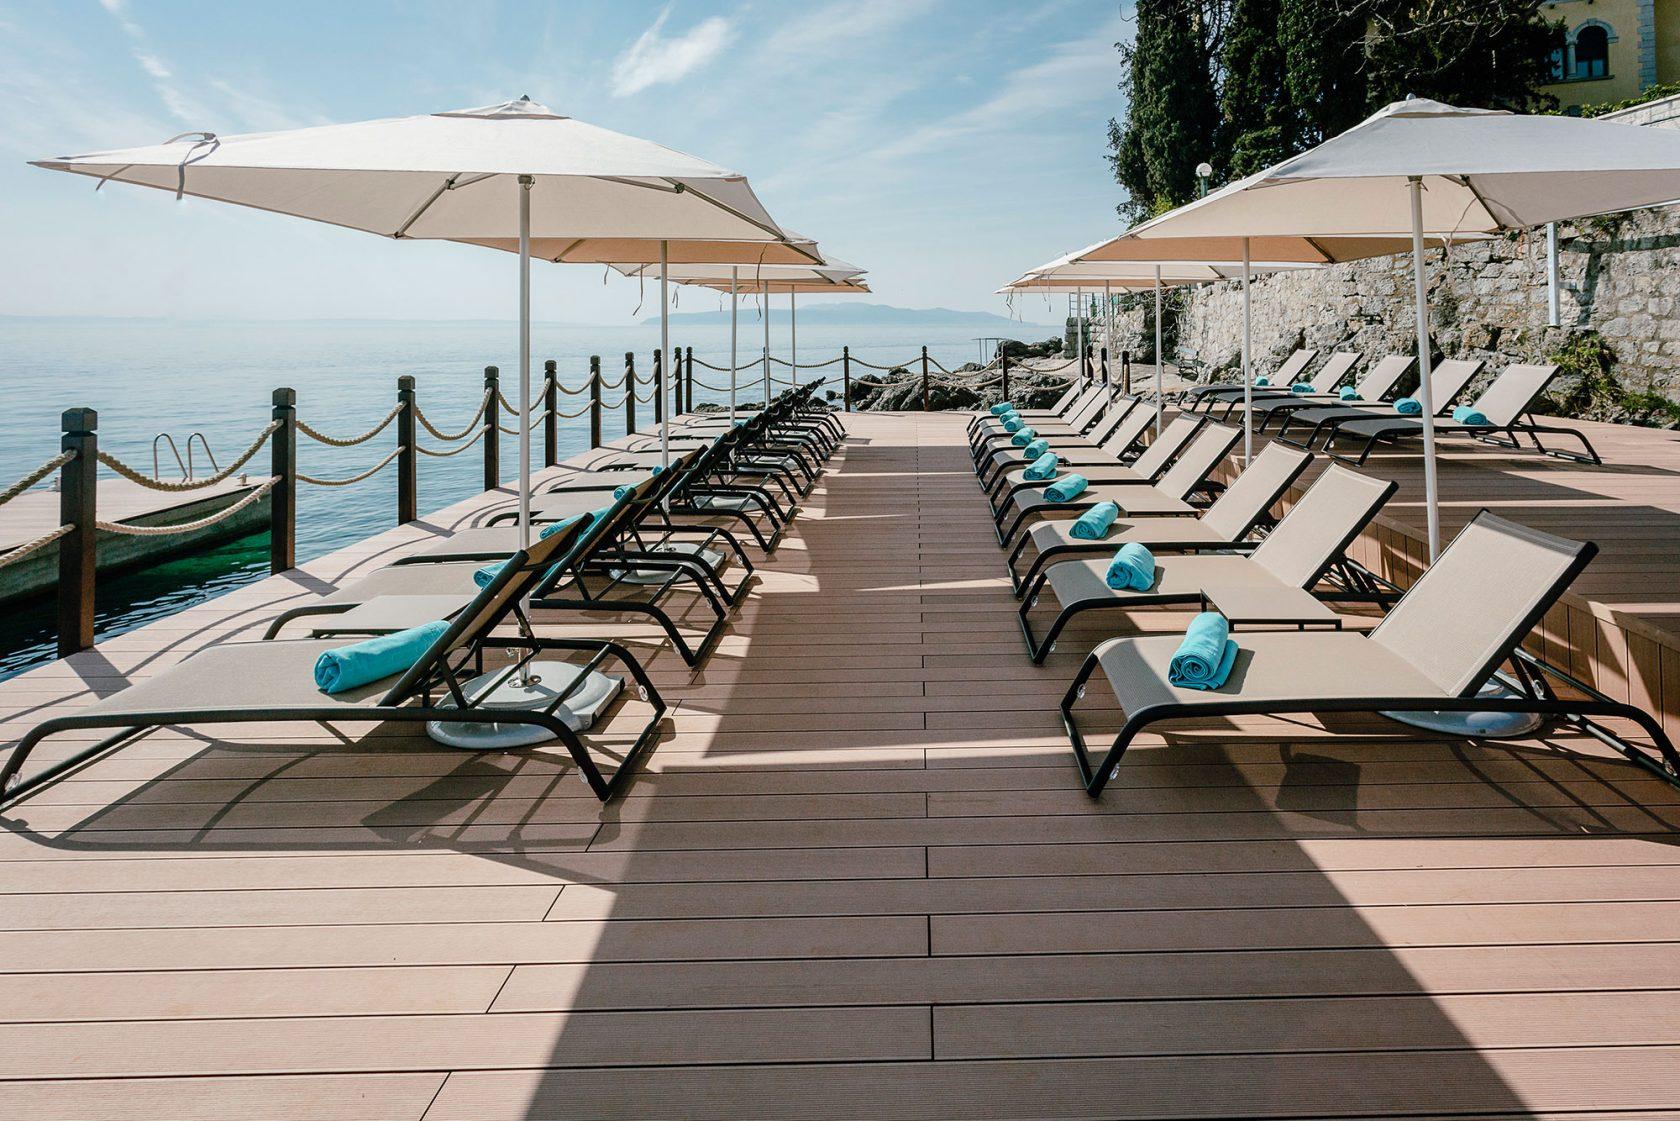 Ikador Luxury Boutique Hotel & Spa Beach Deck